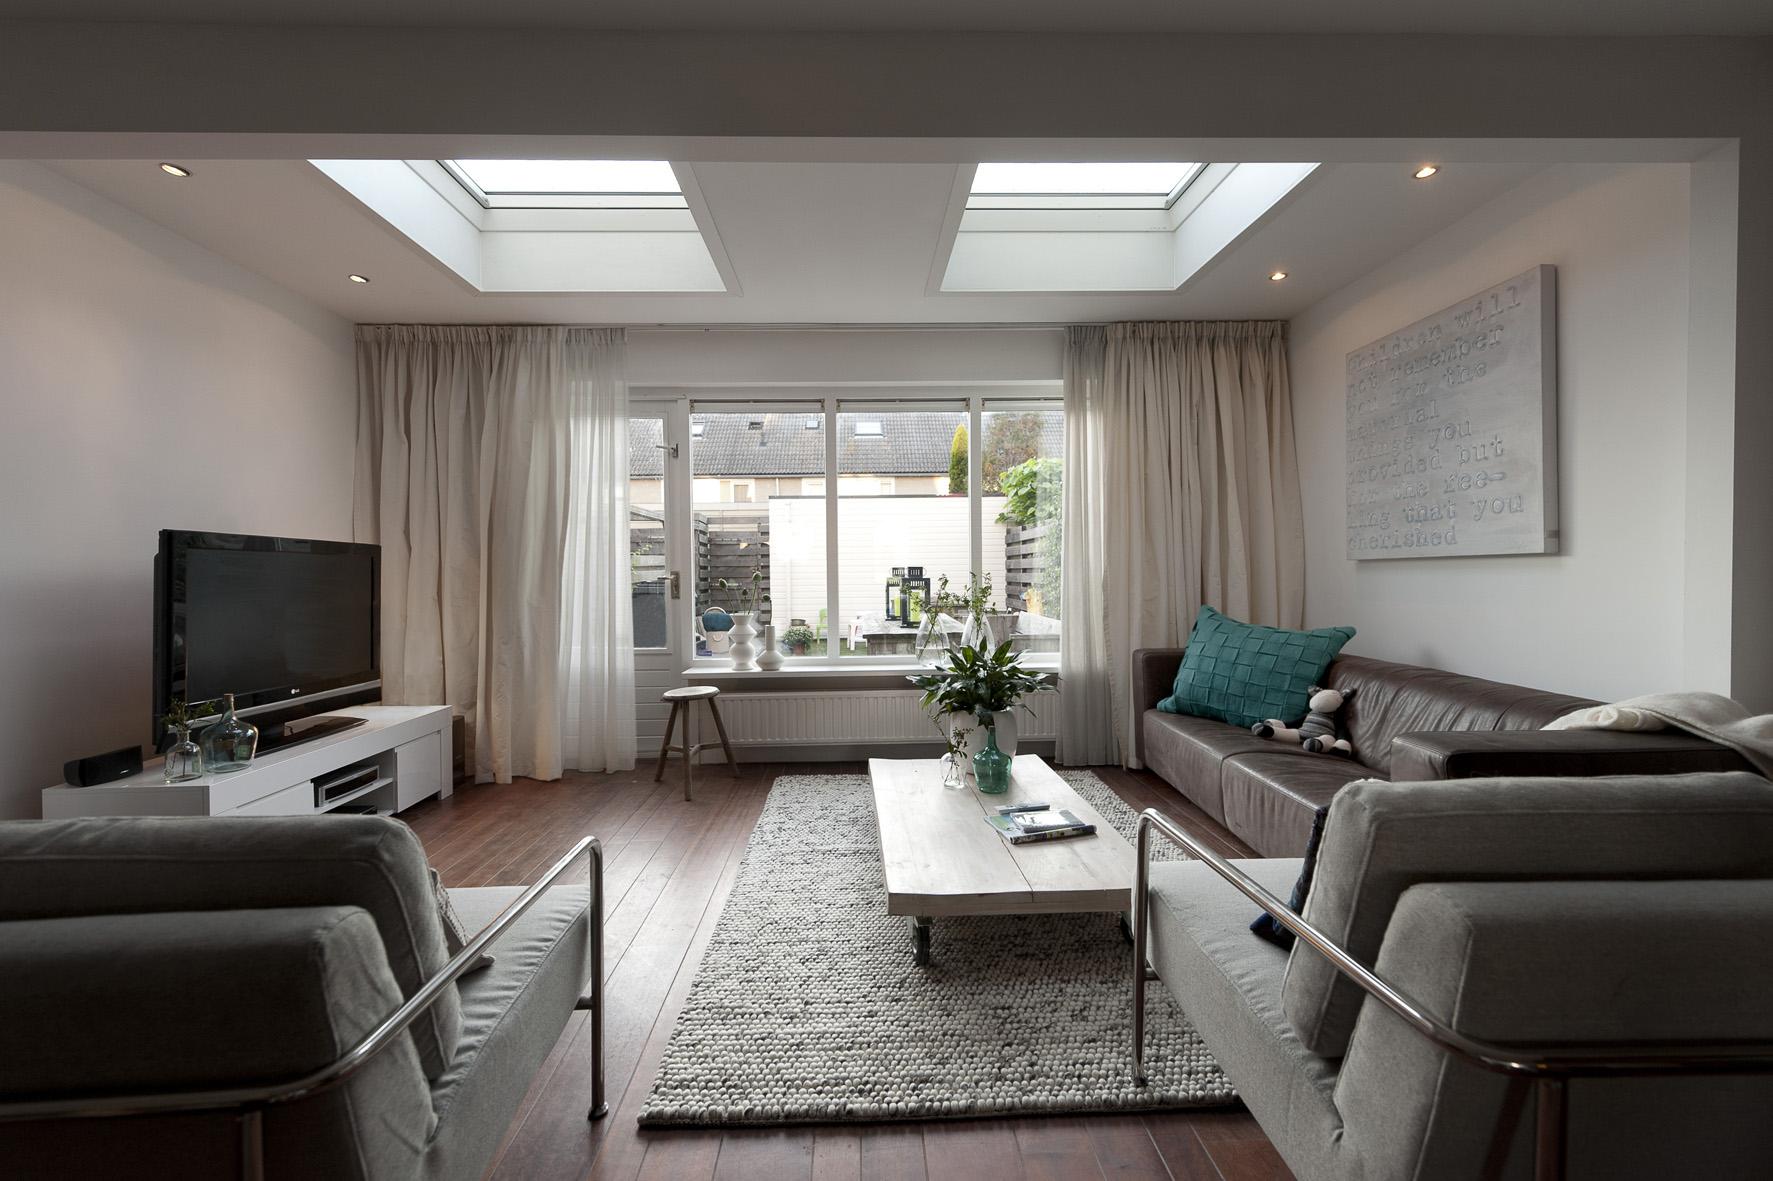 Woonkamer Idee Serre : Serre raamdecoratie u bastasol zonwering outdoor living